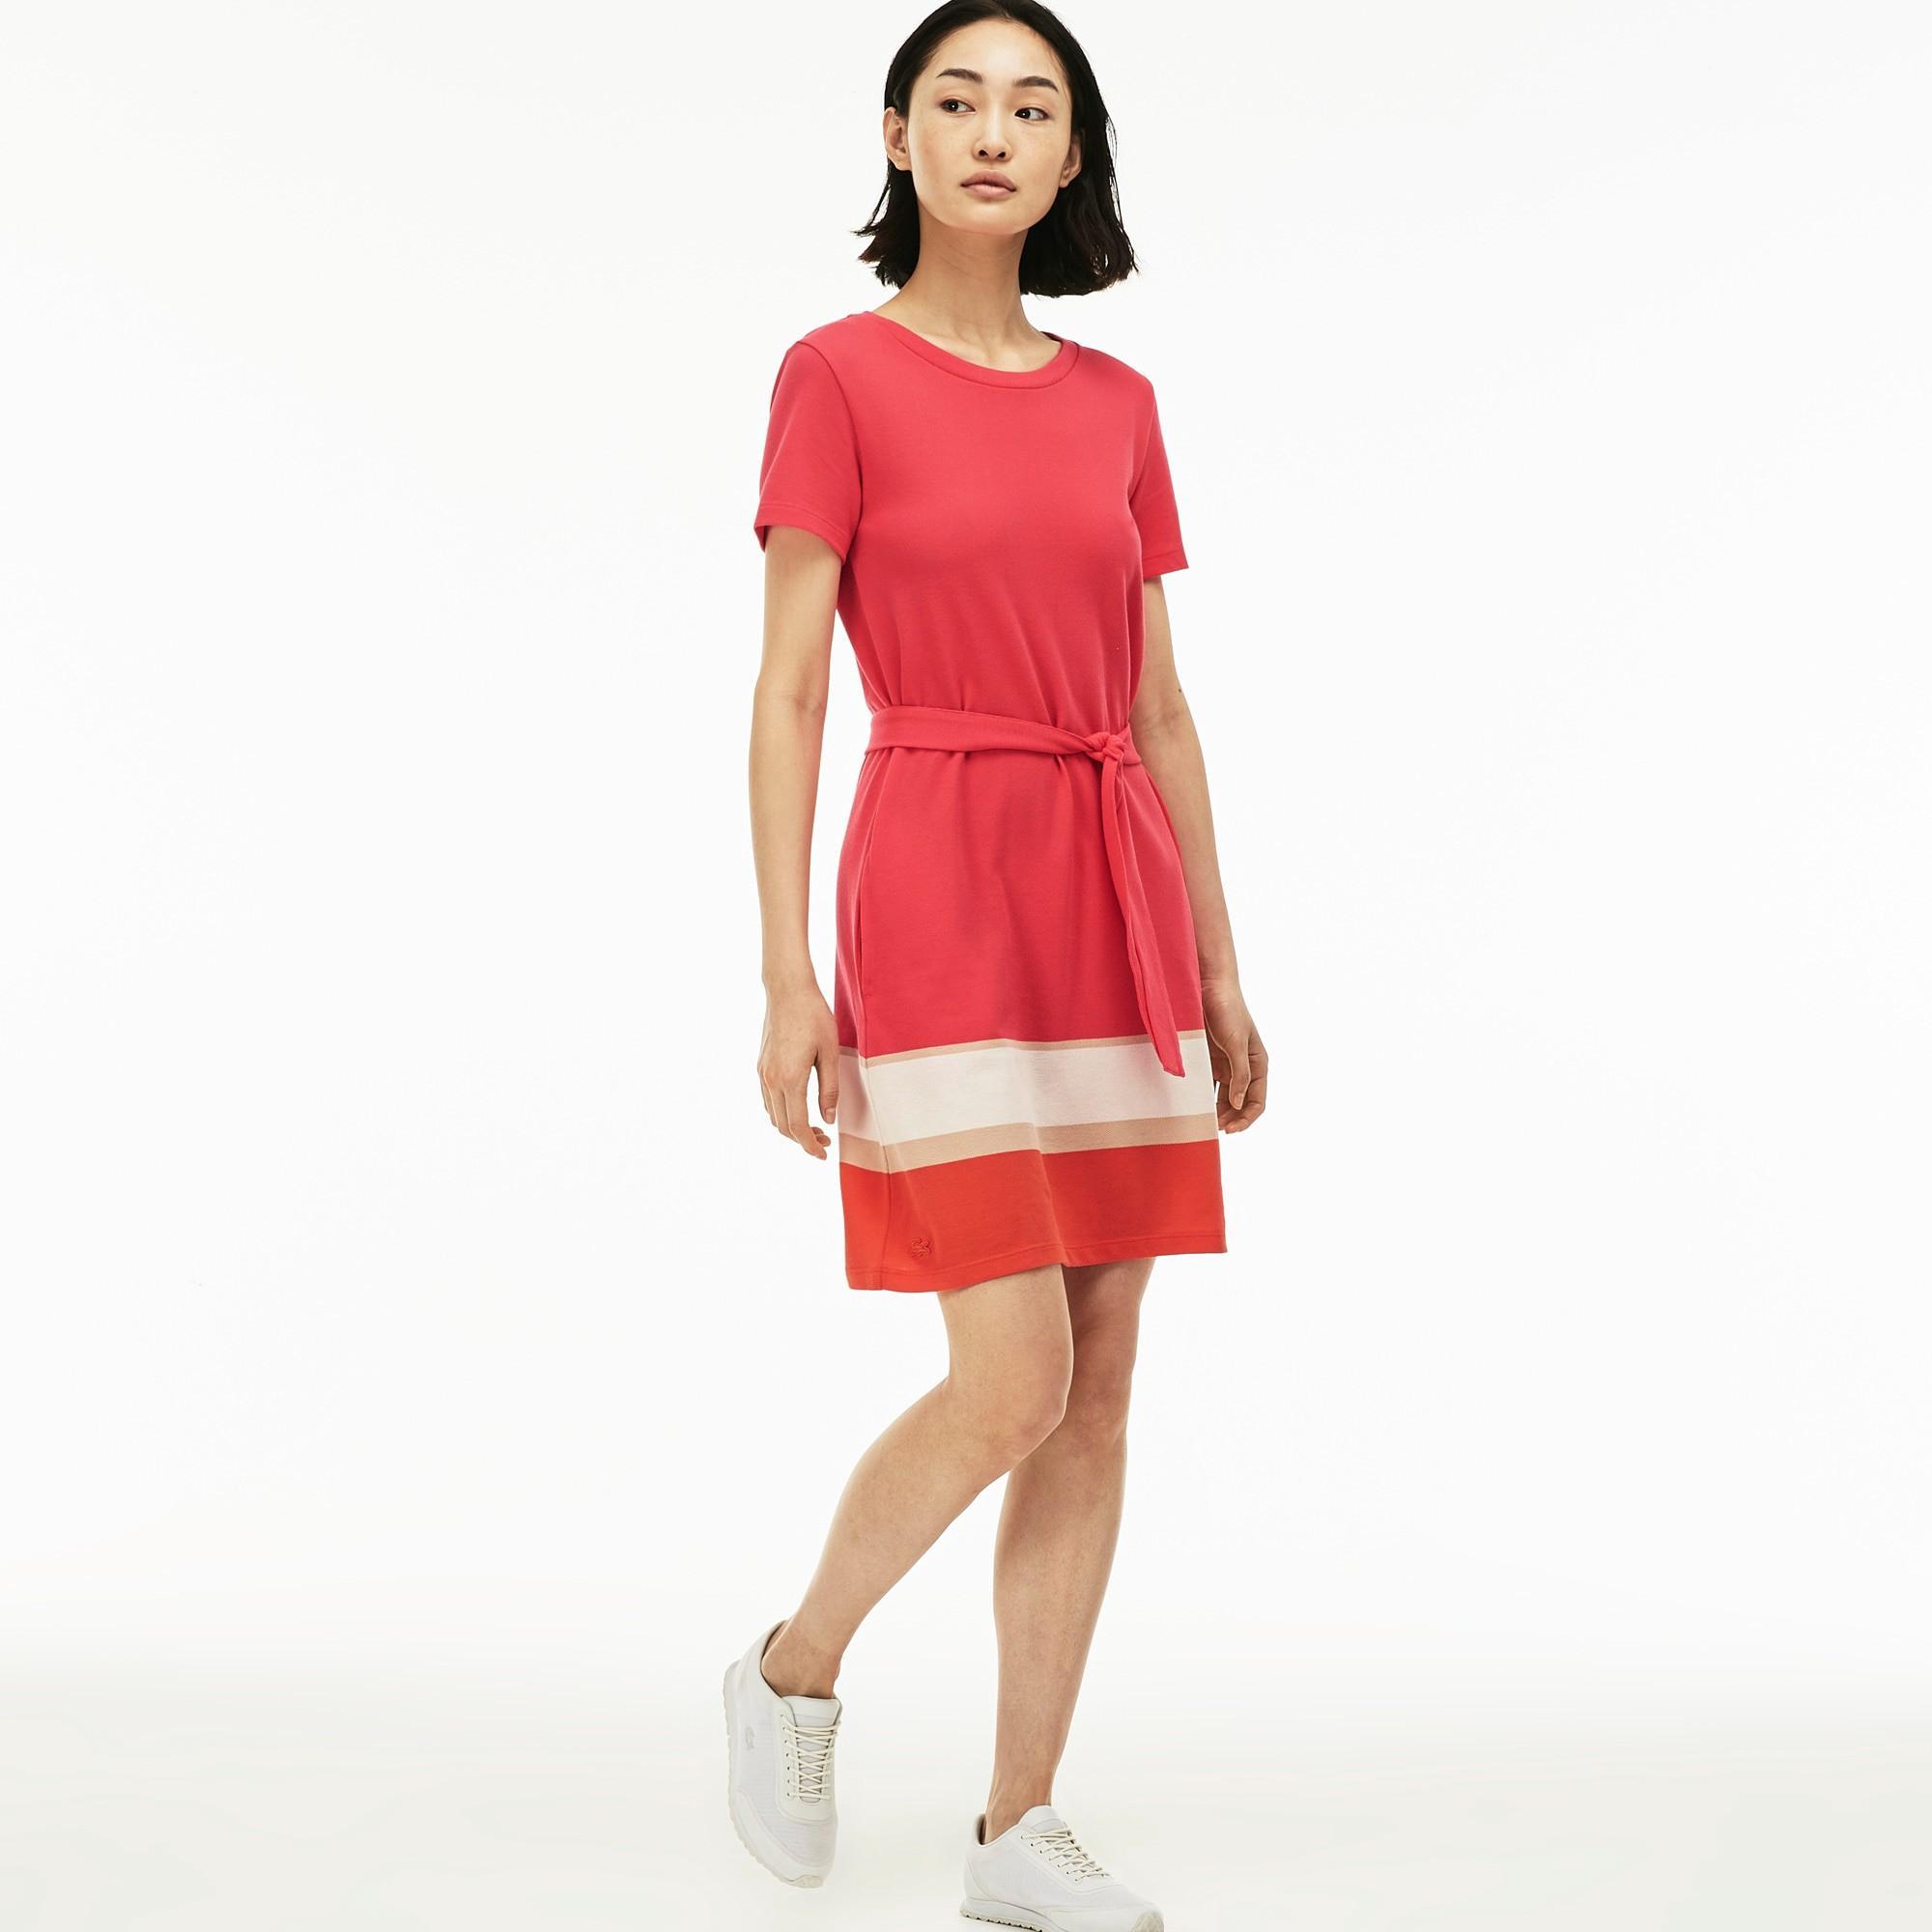 c59b53aa754e Lacoste Women s Colorblock Band PiquÉ T-Shirt Dress - Sirop  Pink Oats-Vanilla